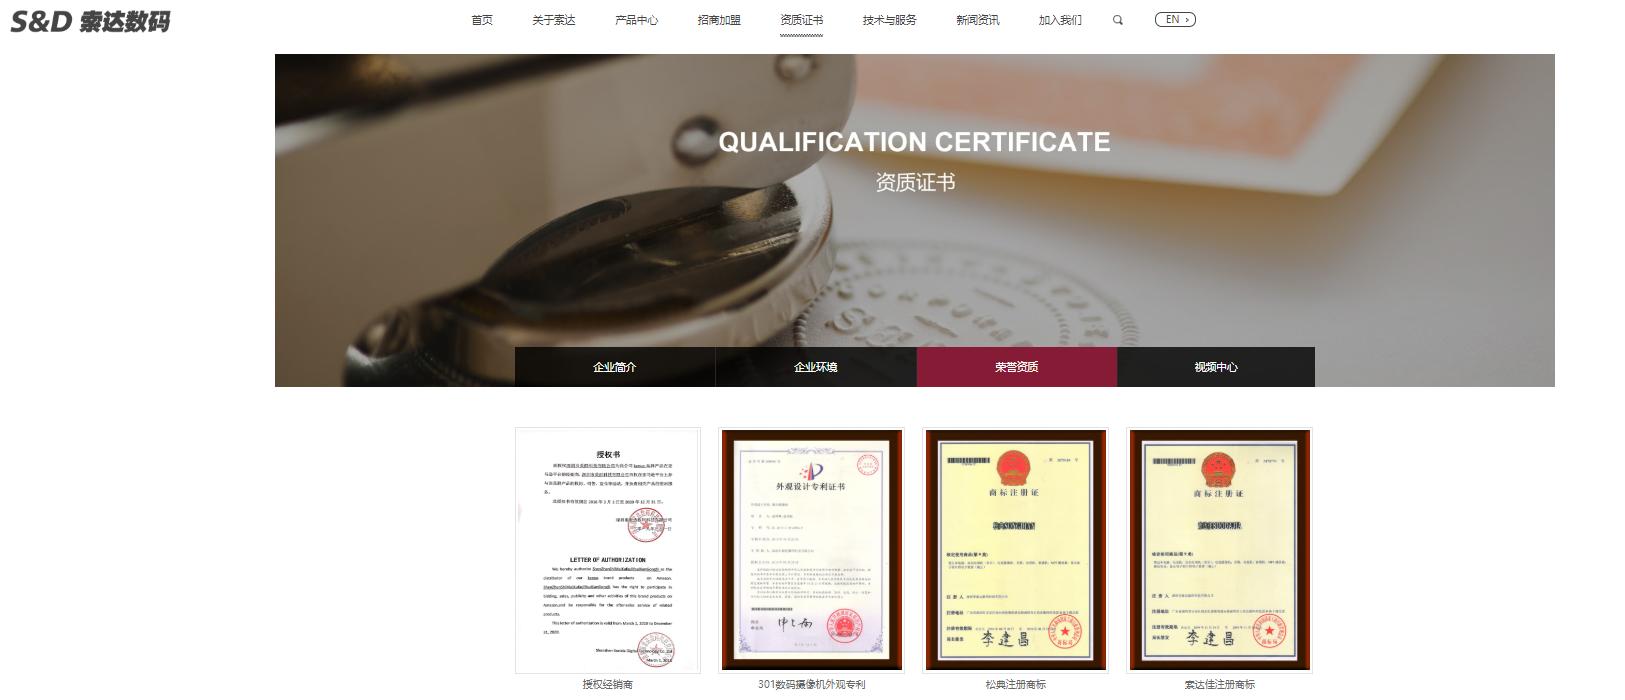 Kenuo商品の品質に関する画像